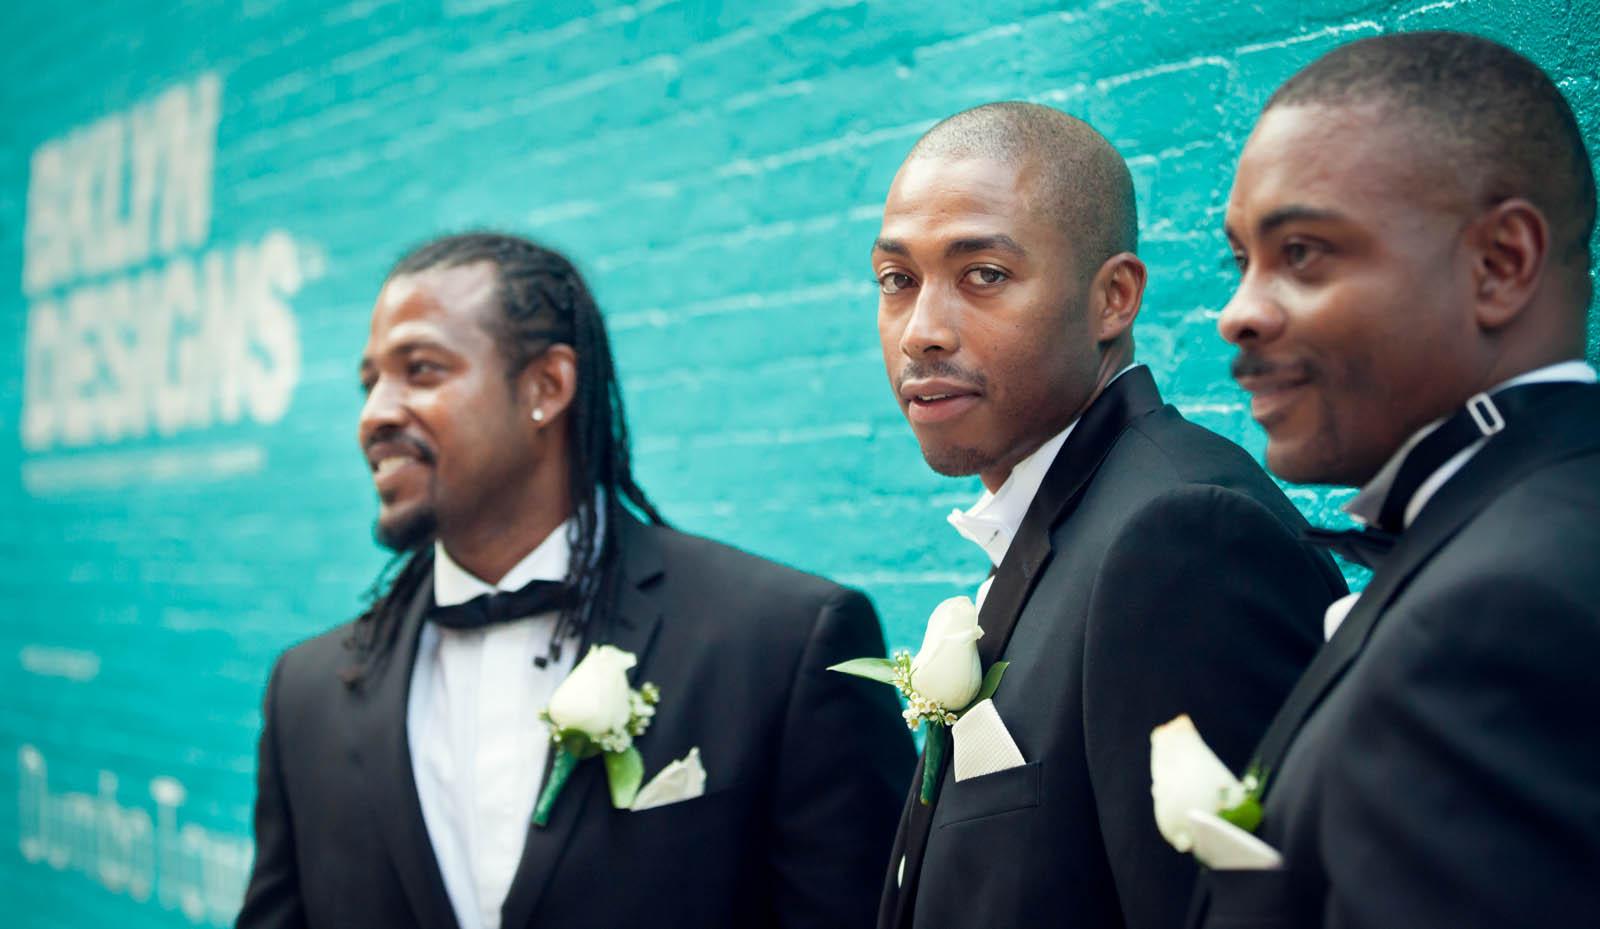 Malik_and_Shanika_Wedding_Ernestosue-1107-Edit.jpg